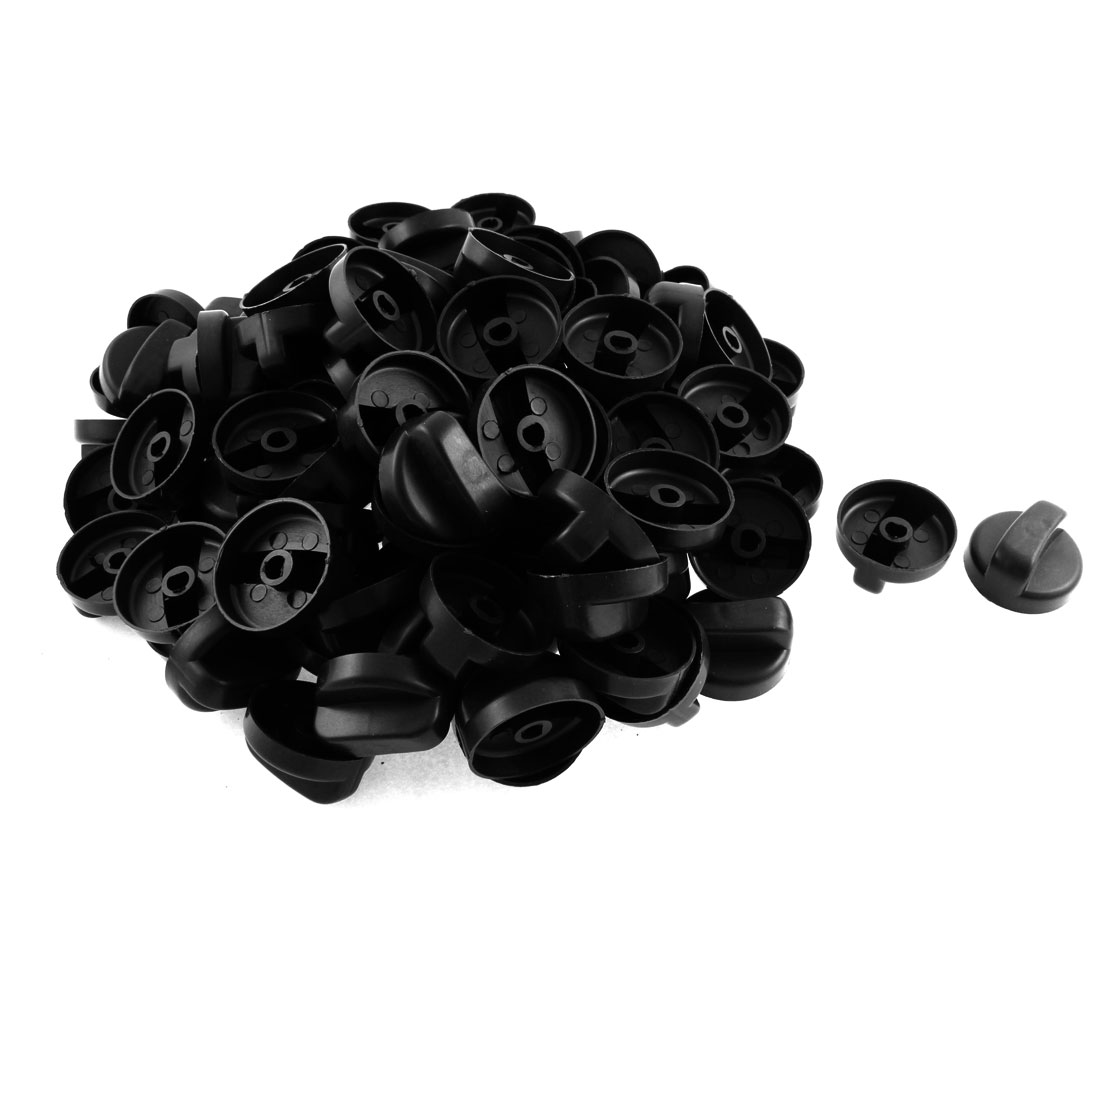 Kitchen Black Plastic Rotary Switch Range Knob for Gas Stove 100 Pcs